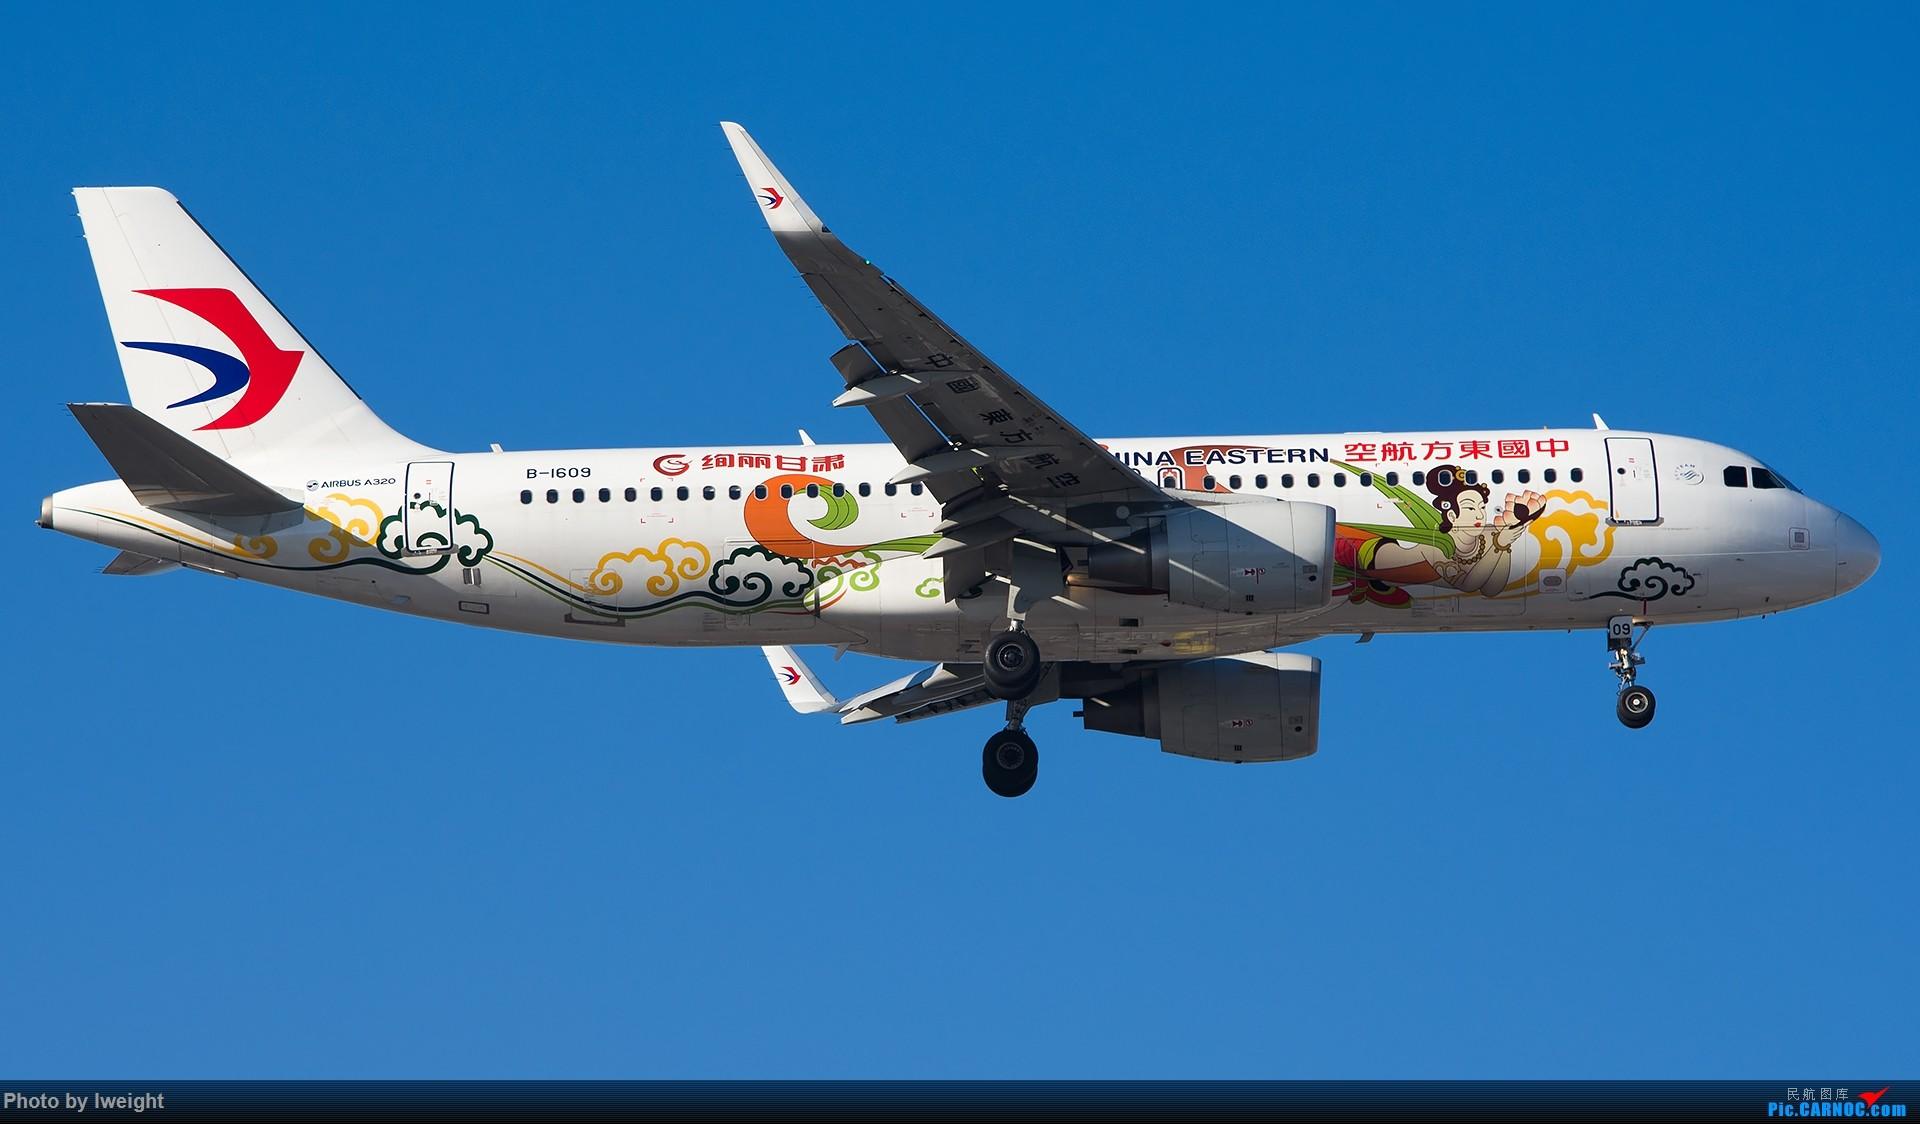 Re:[原创]终于在12月的北京等到了一个晴天的周末,出来拍拍飞机【2015-12-5】 AIRBUS A320-200 B-1609 中国北京首都国际机场